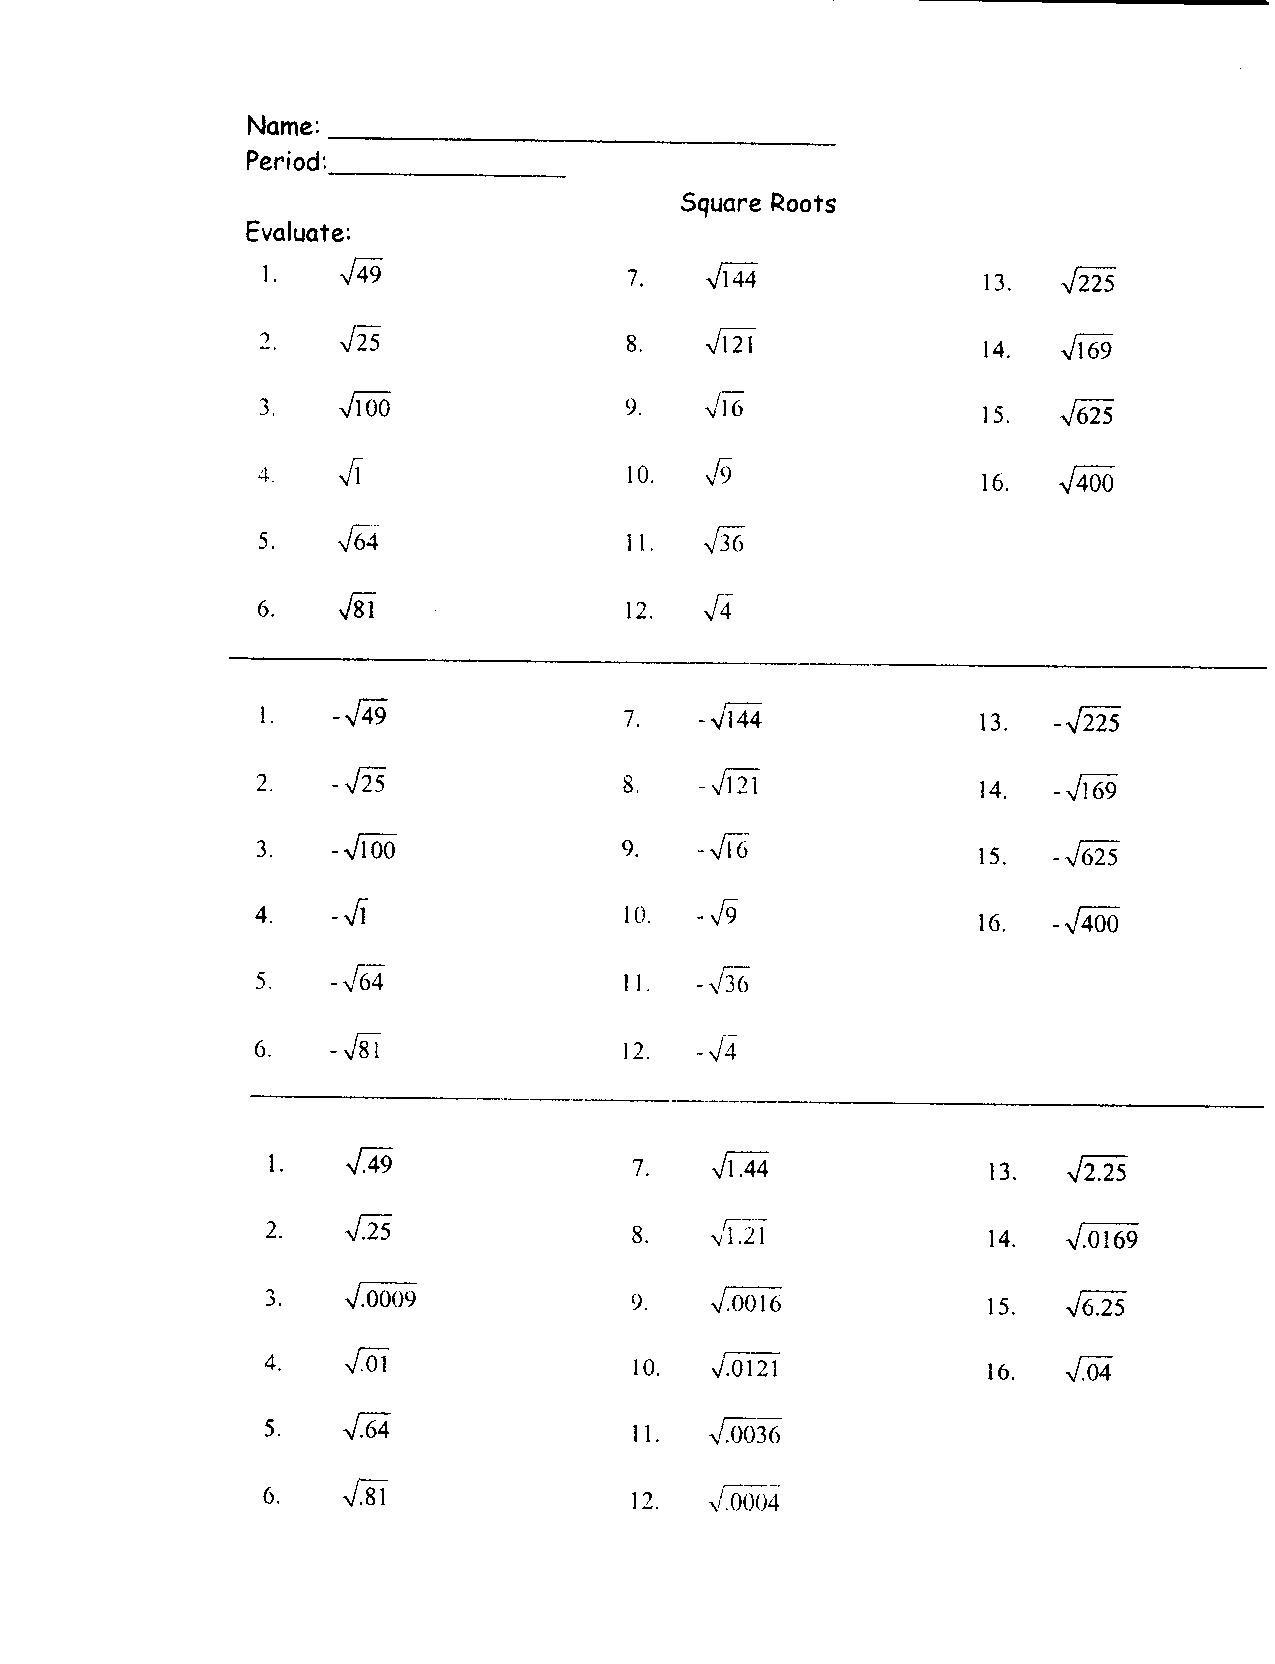 Estimating Square Root Worksheet 31 Perfect Square Roots Worksheet Worksheet Resource Plans